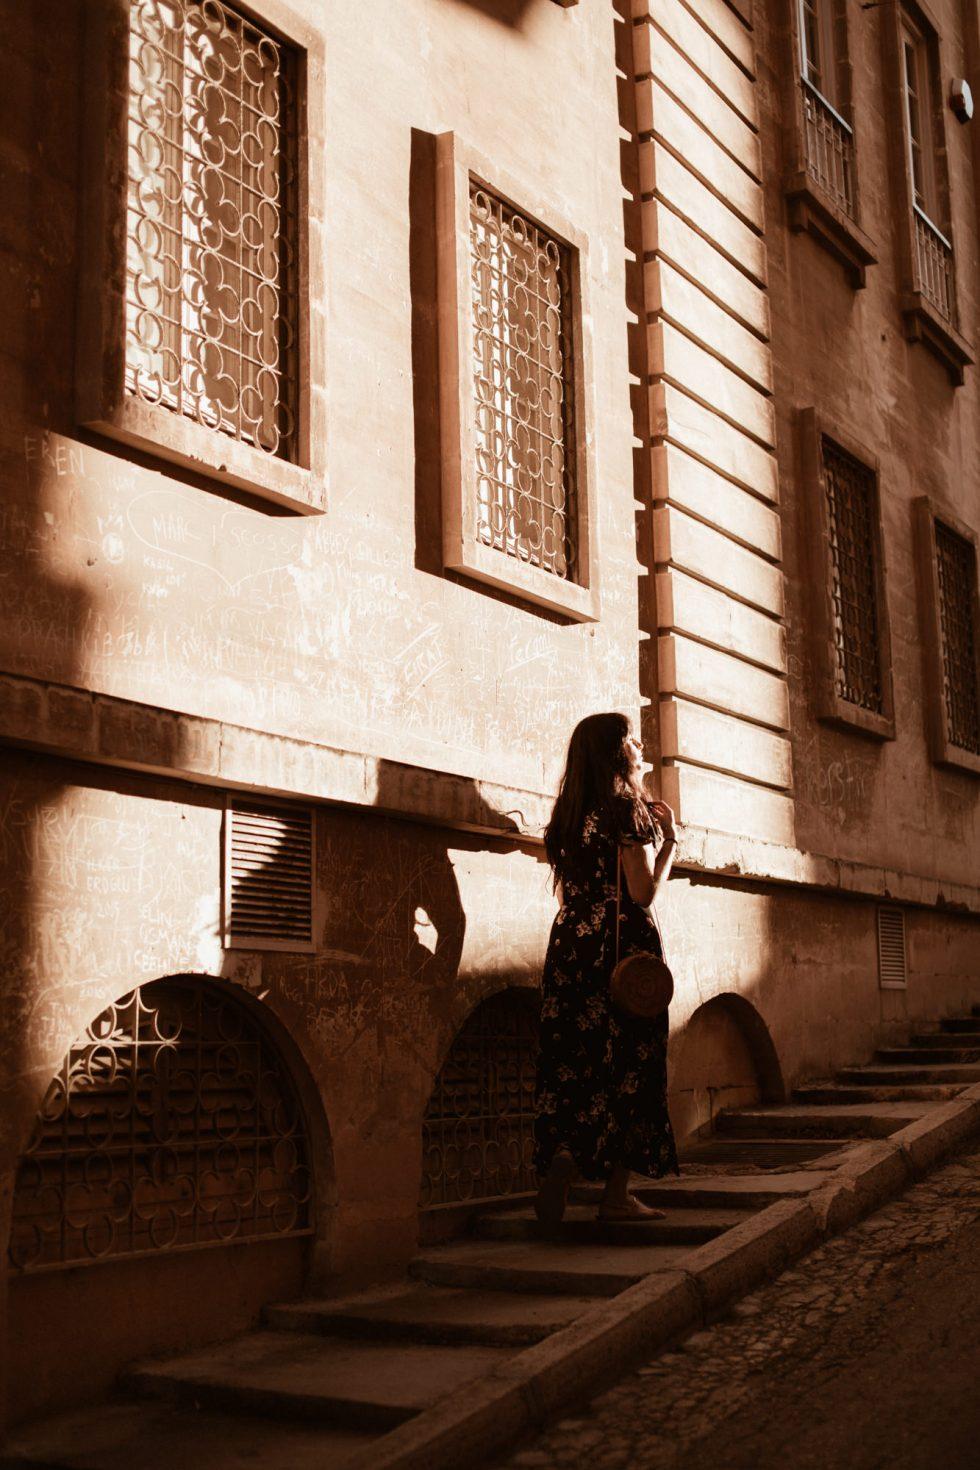 malta-travel-lifestyle-photographer-laura-g-diaz-7